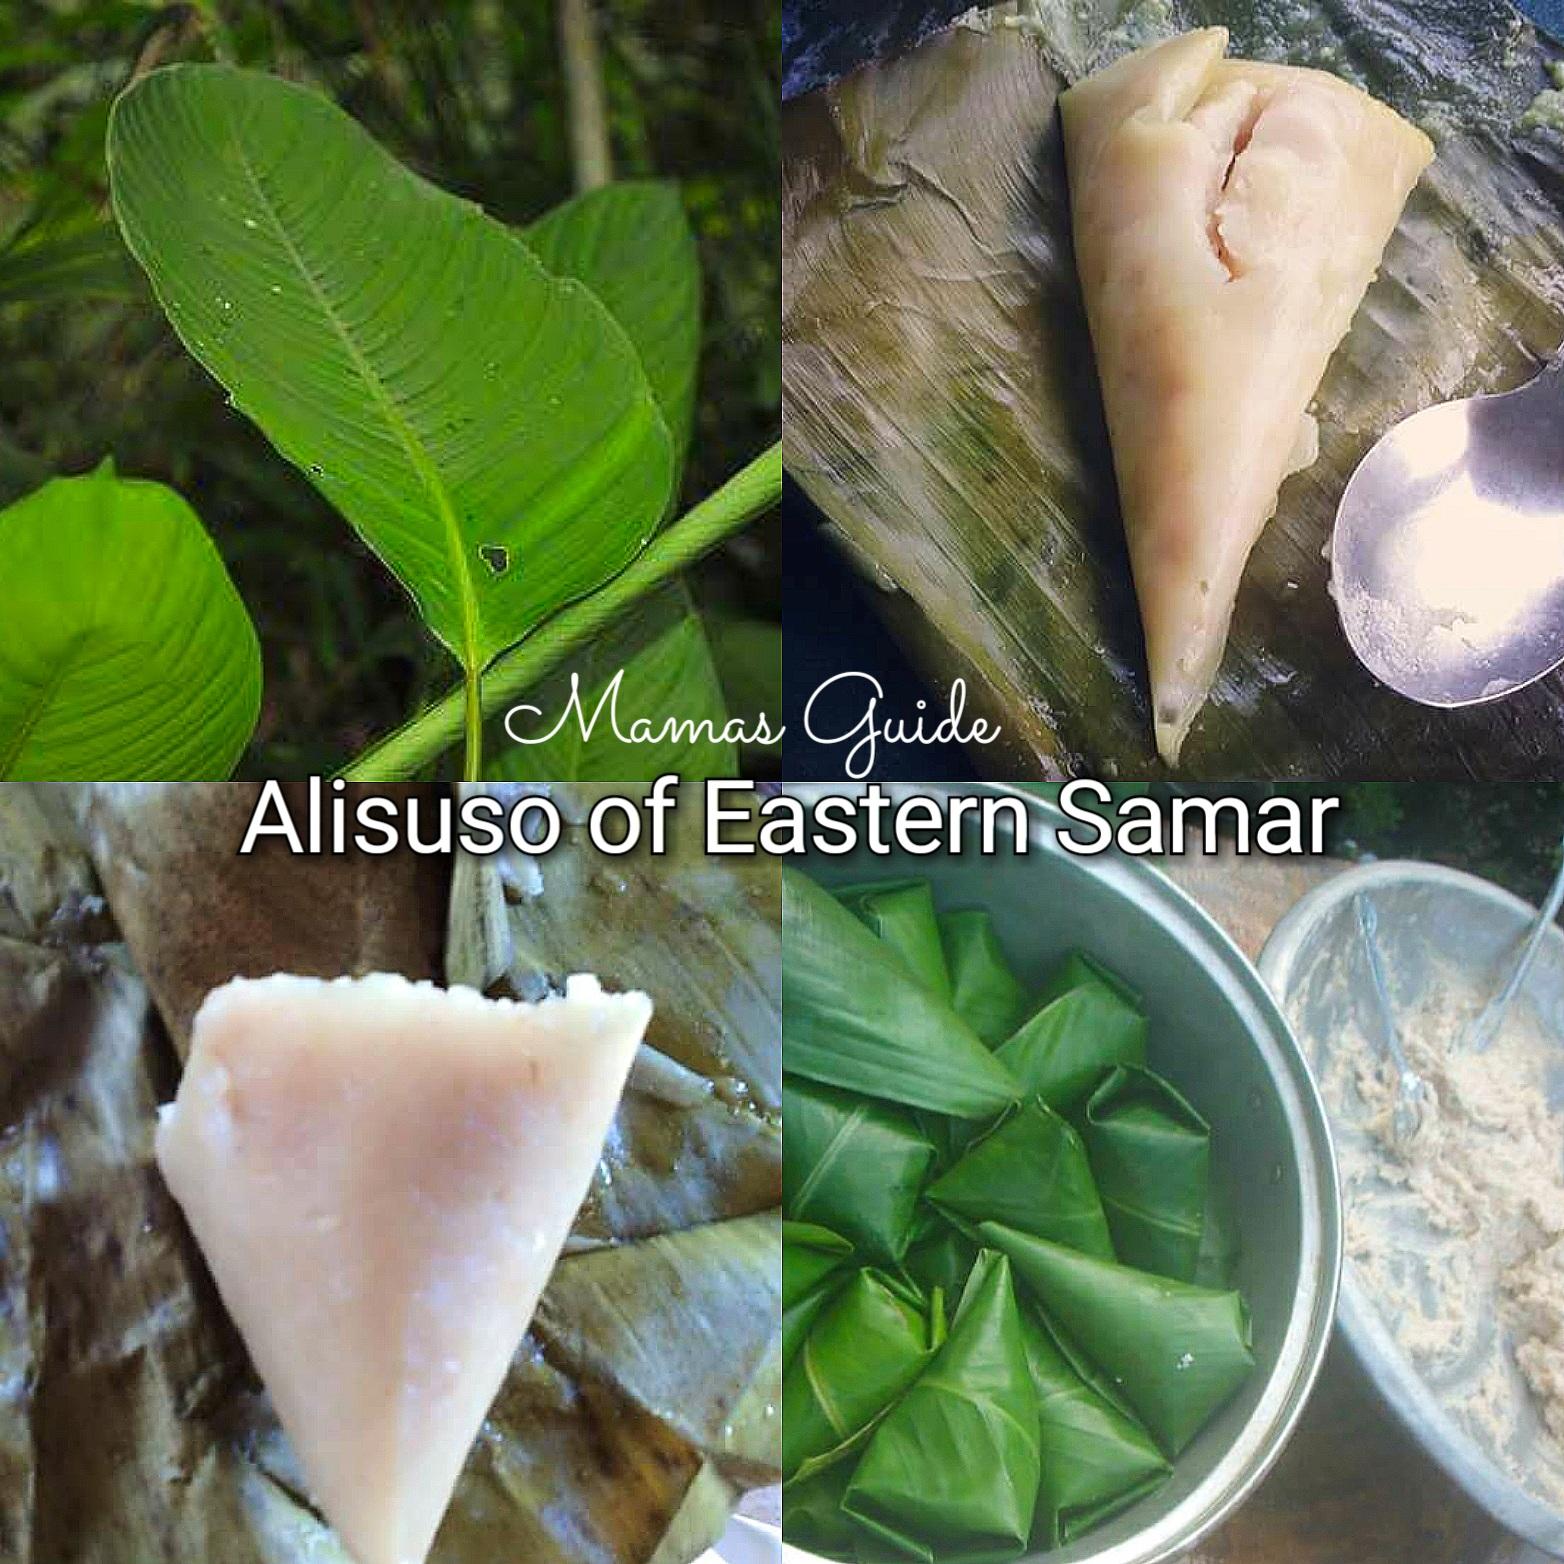 ALISUSO OF EASTERN SAMAR